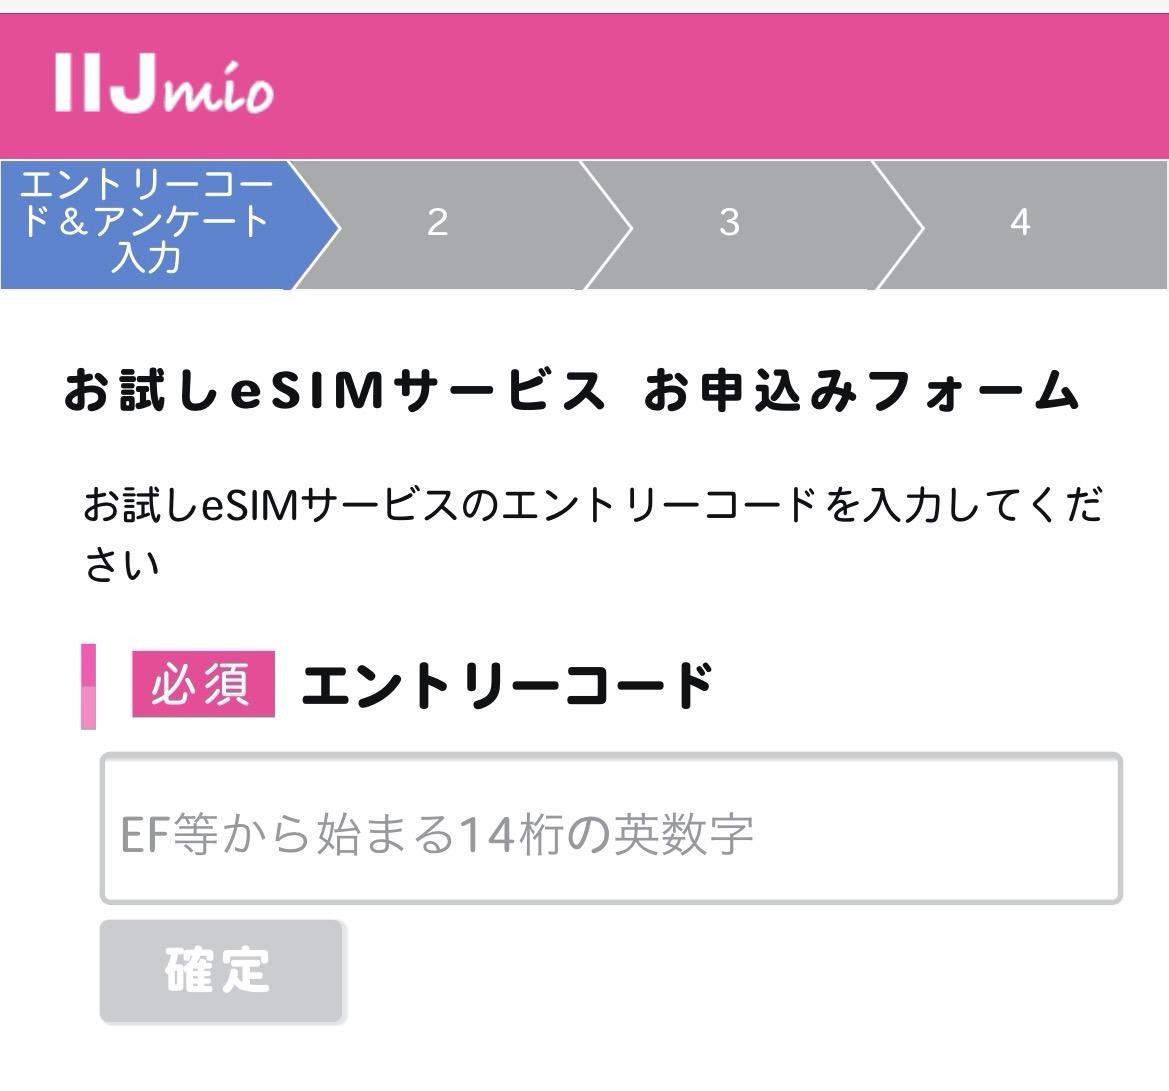 IIJmio お試しeSIMサービス